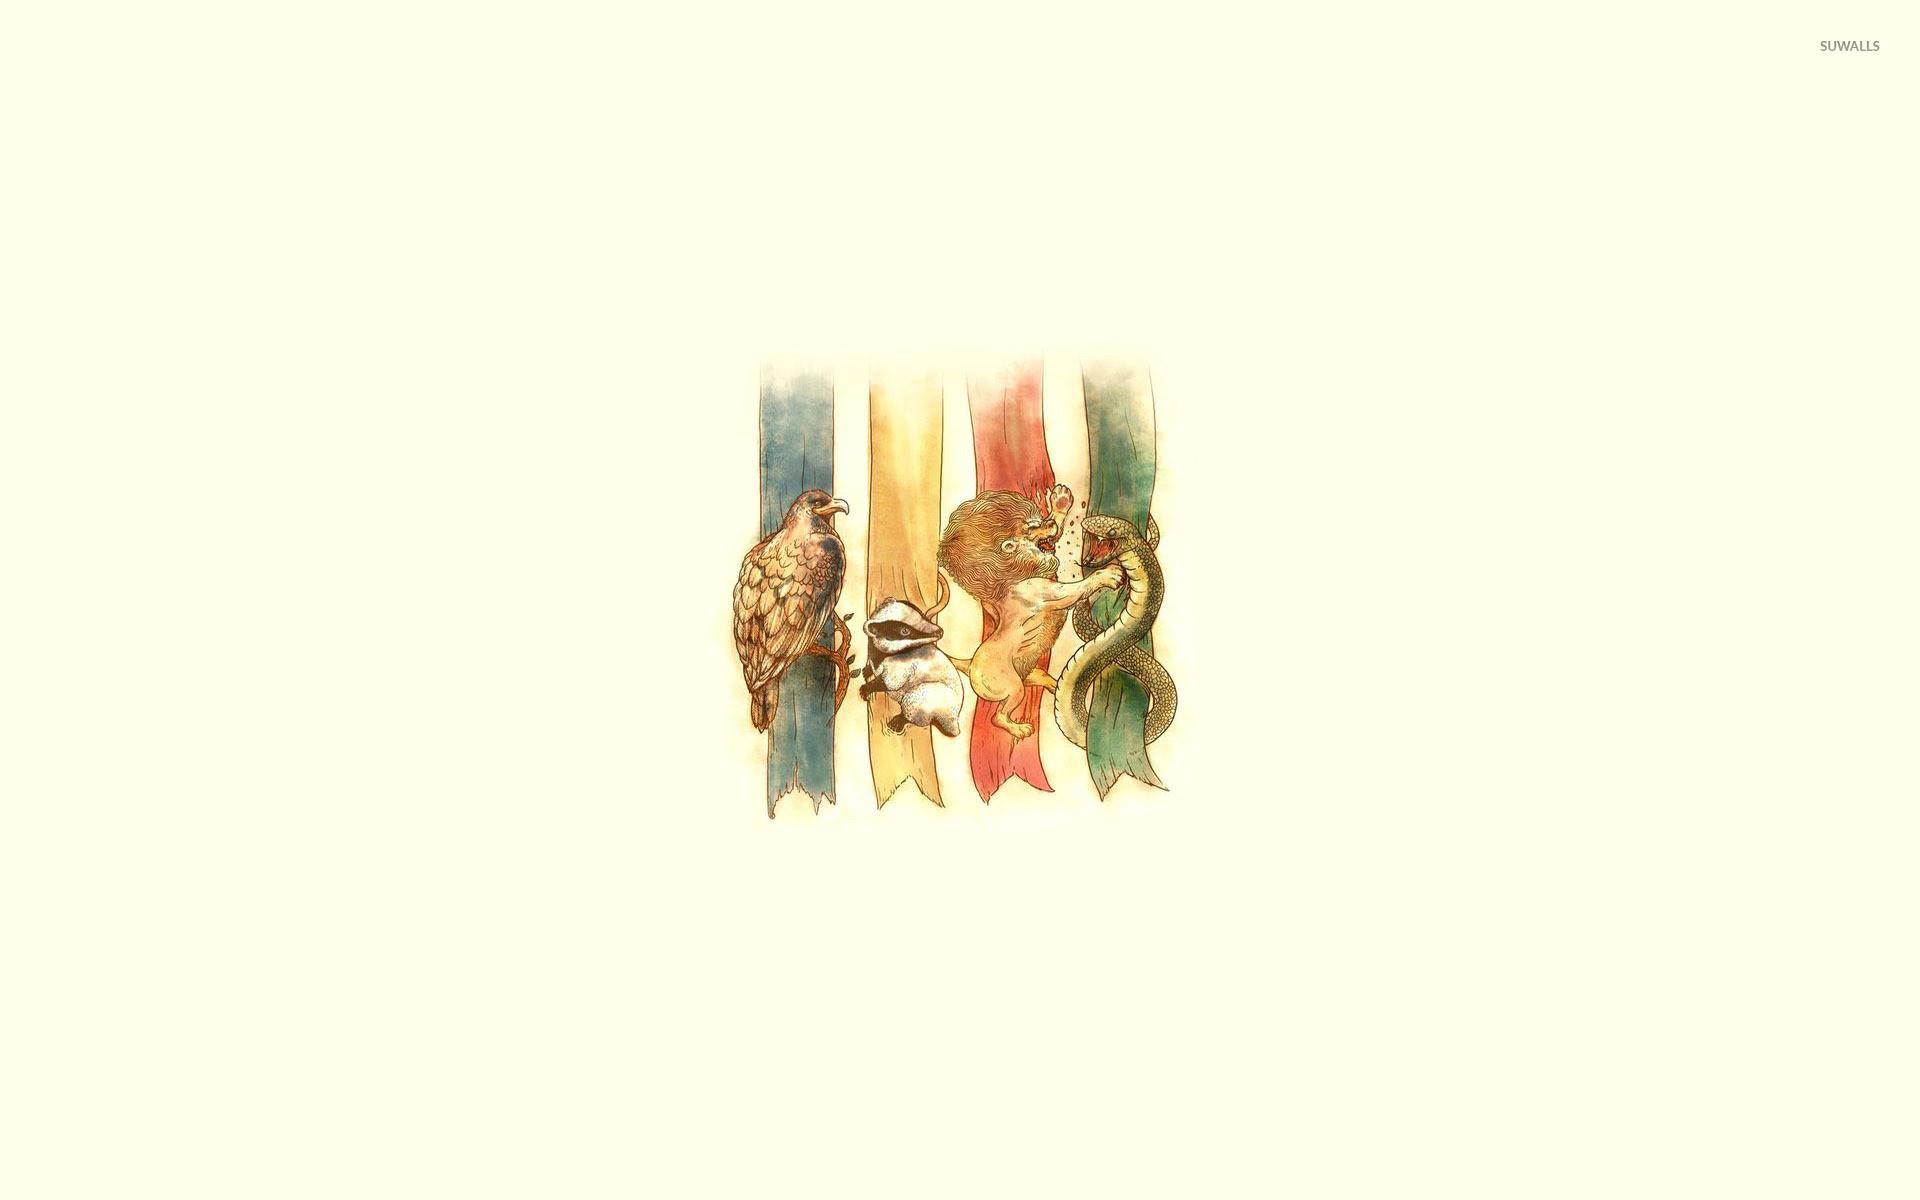 Harry Potter Slytherin Wallpaper 62 Images